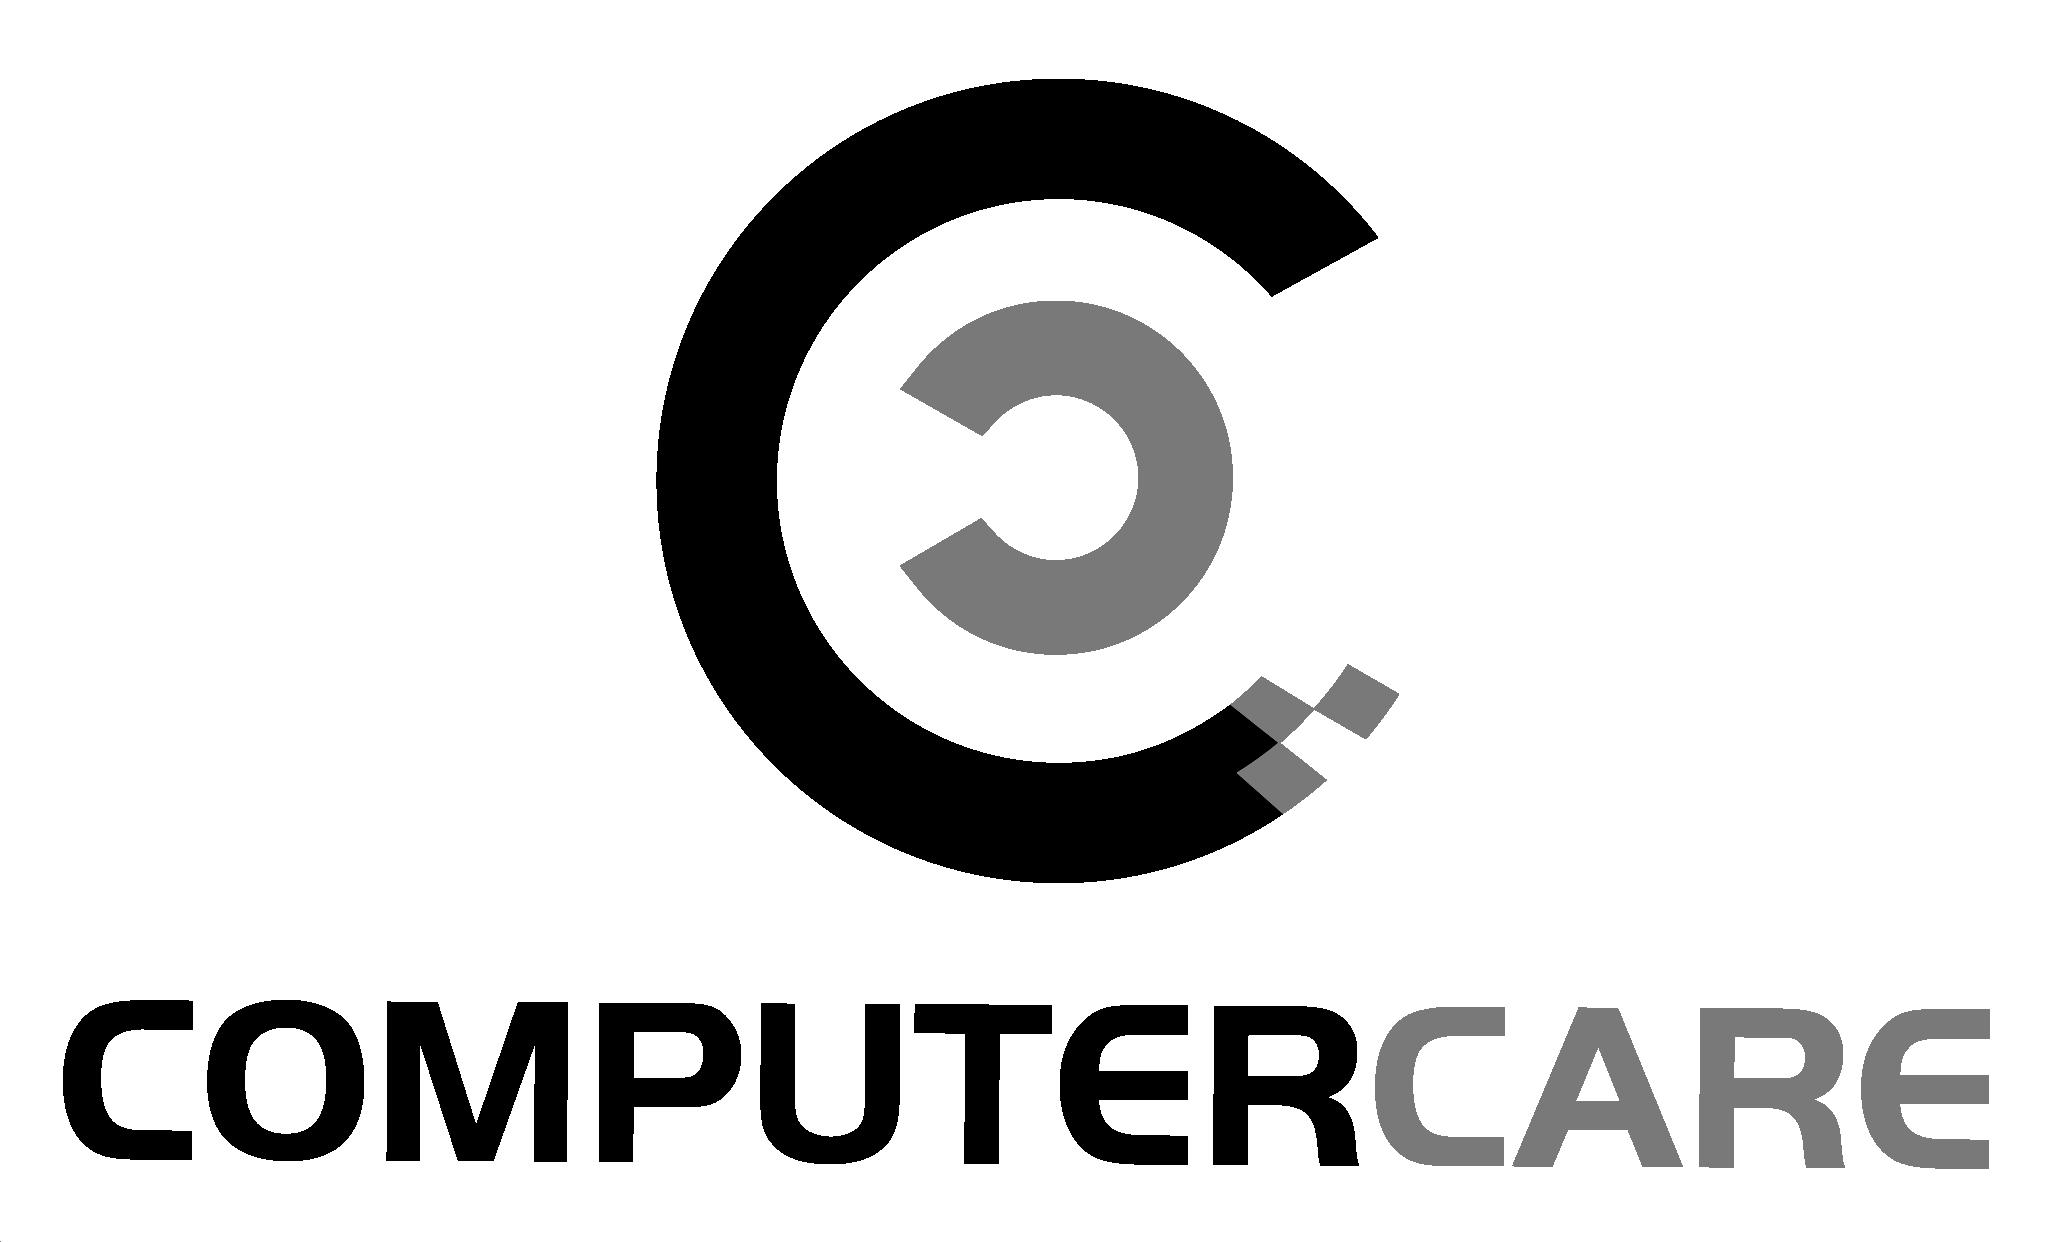 ComputerCare Logo Vertical Transparent.png